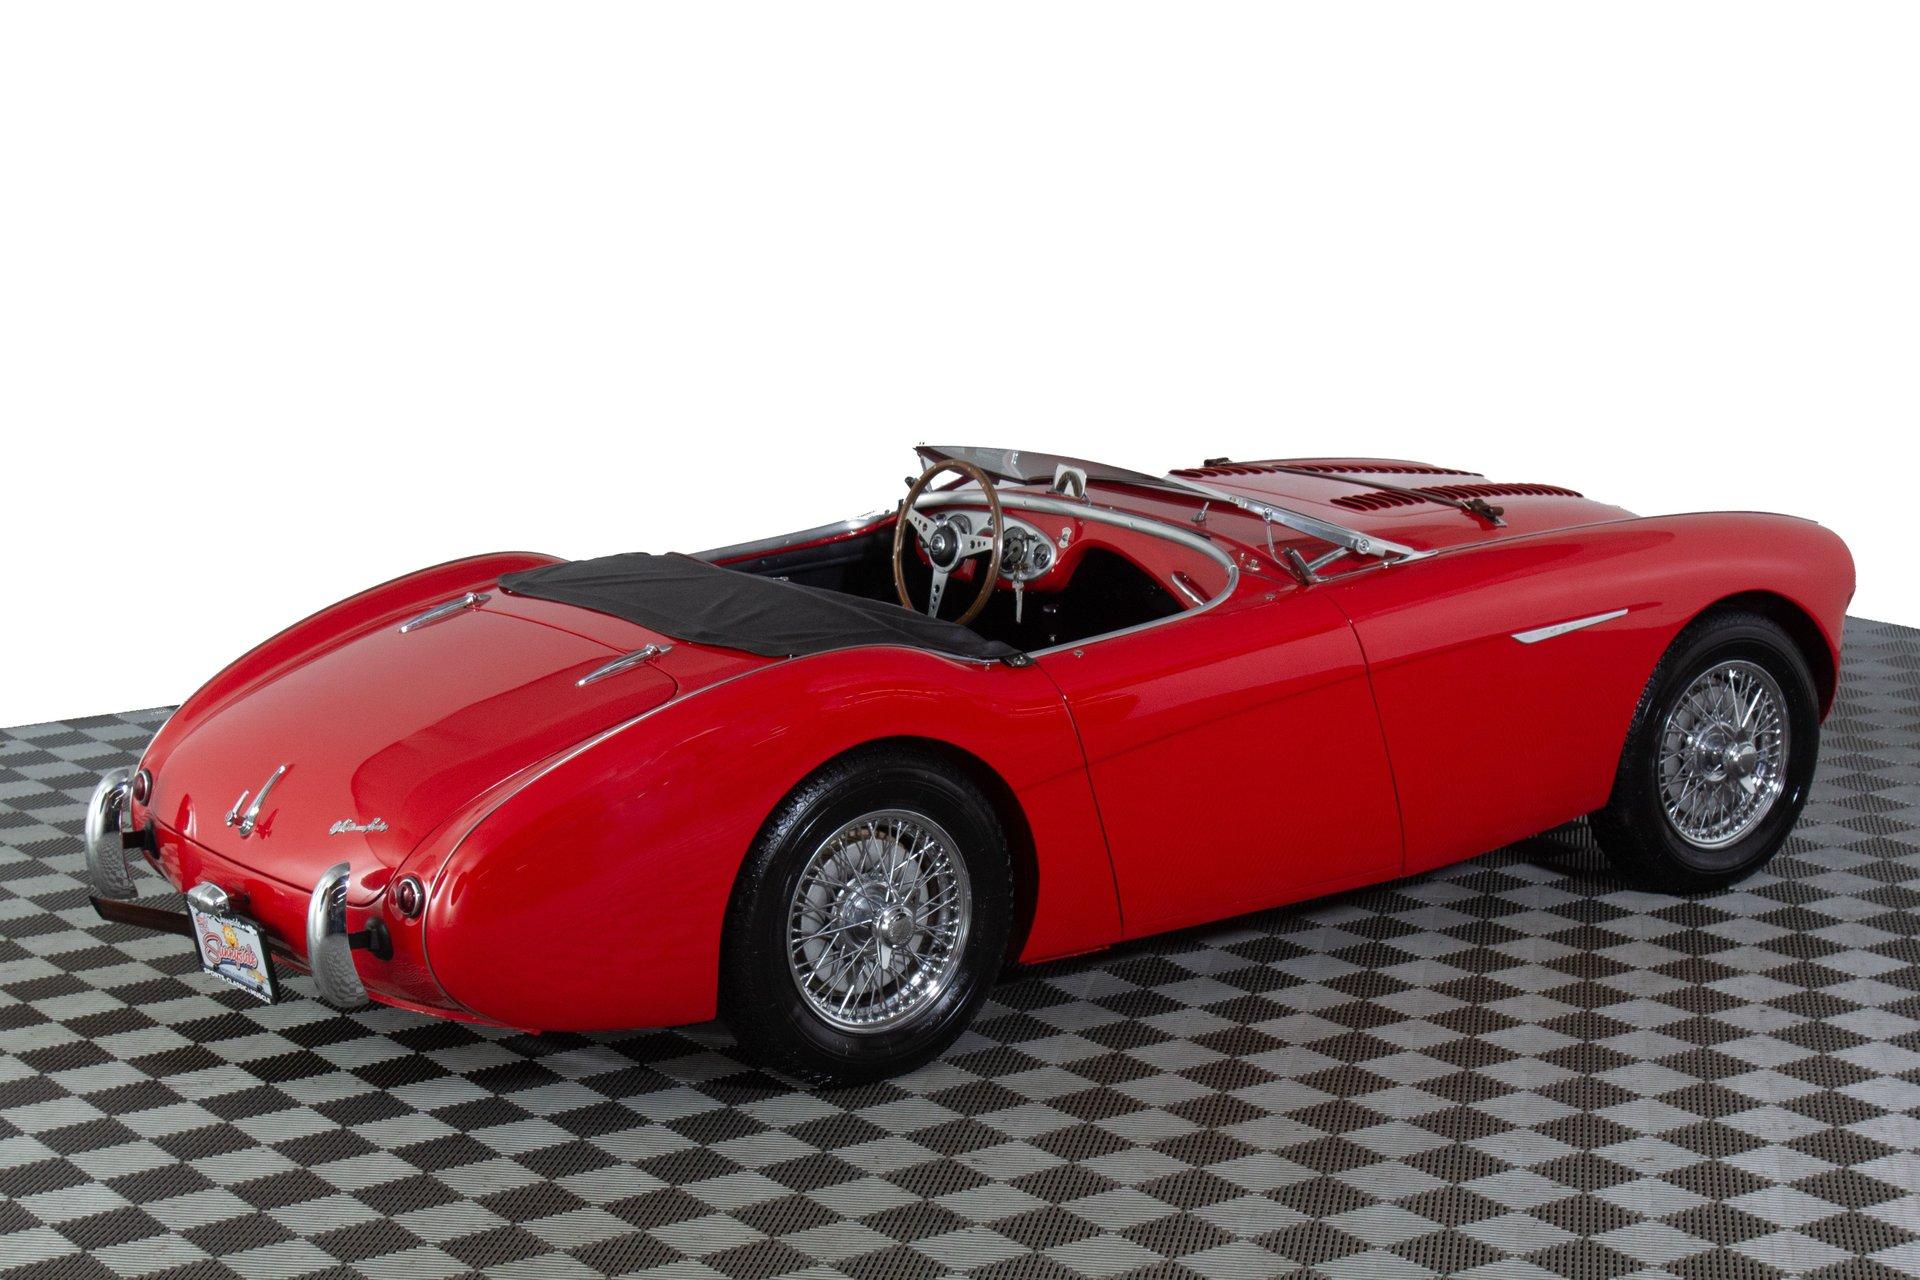 1954 Austin-Healey 100M